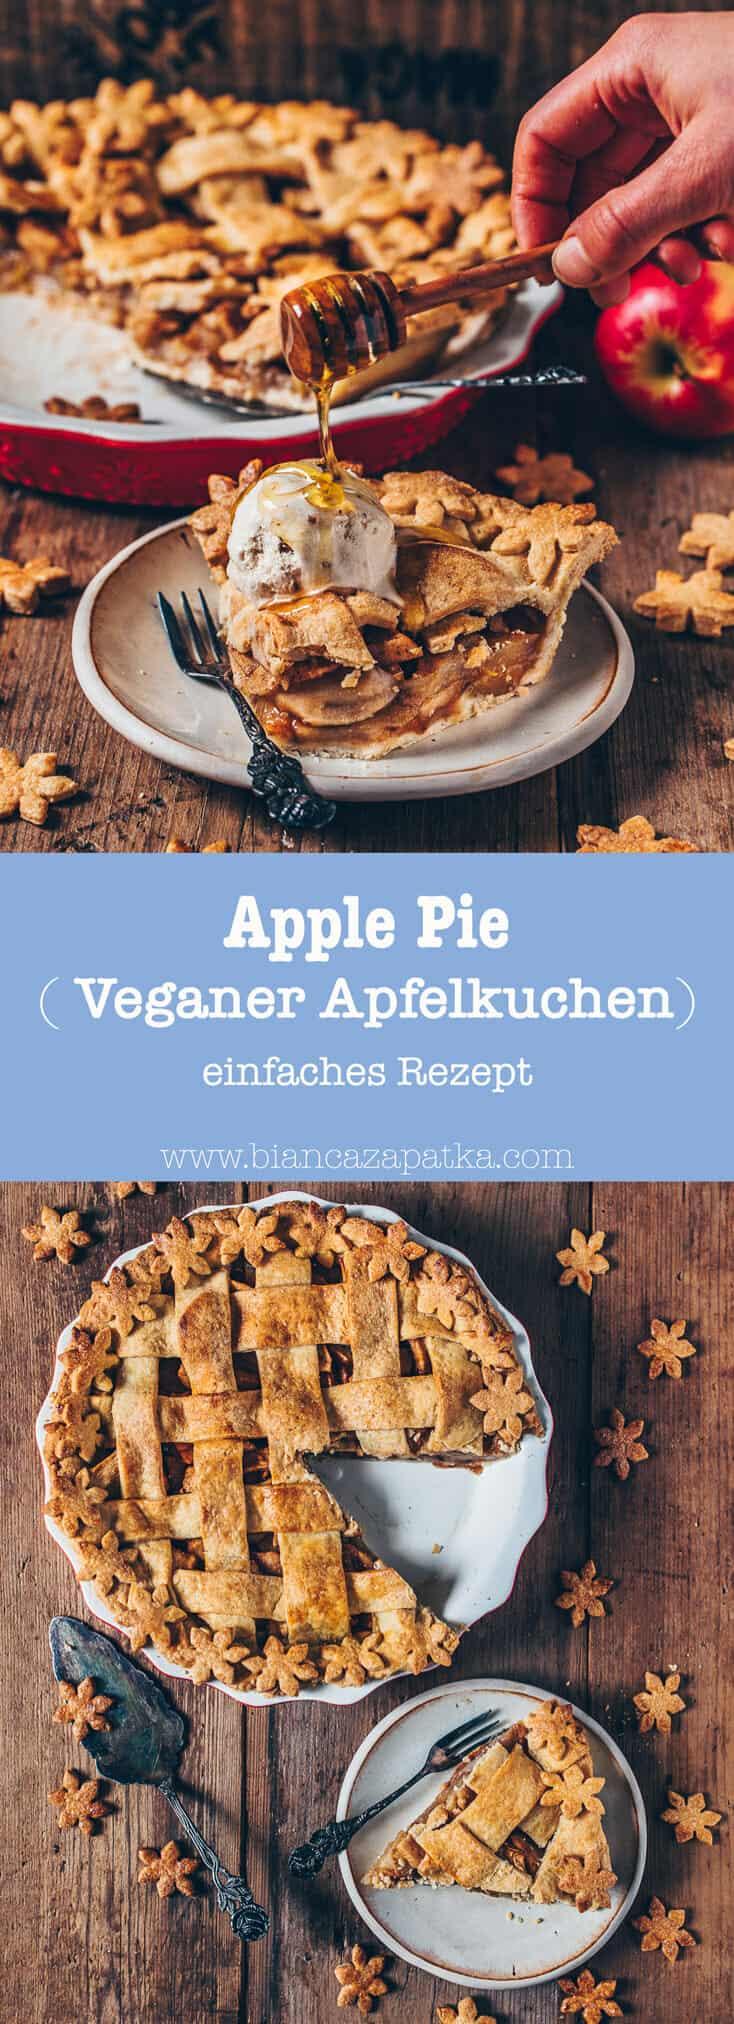 Apfelkuchen Vegan Apple Pie Einfaches Rezept Bianca Zapatka